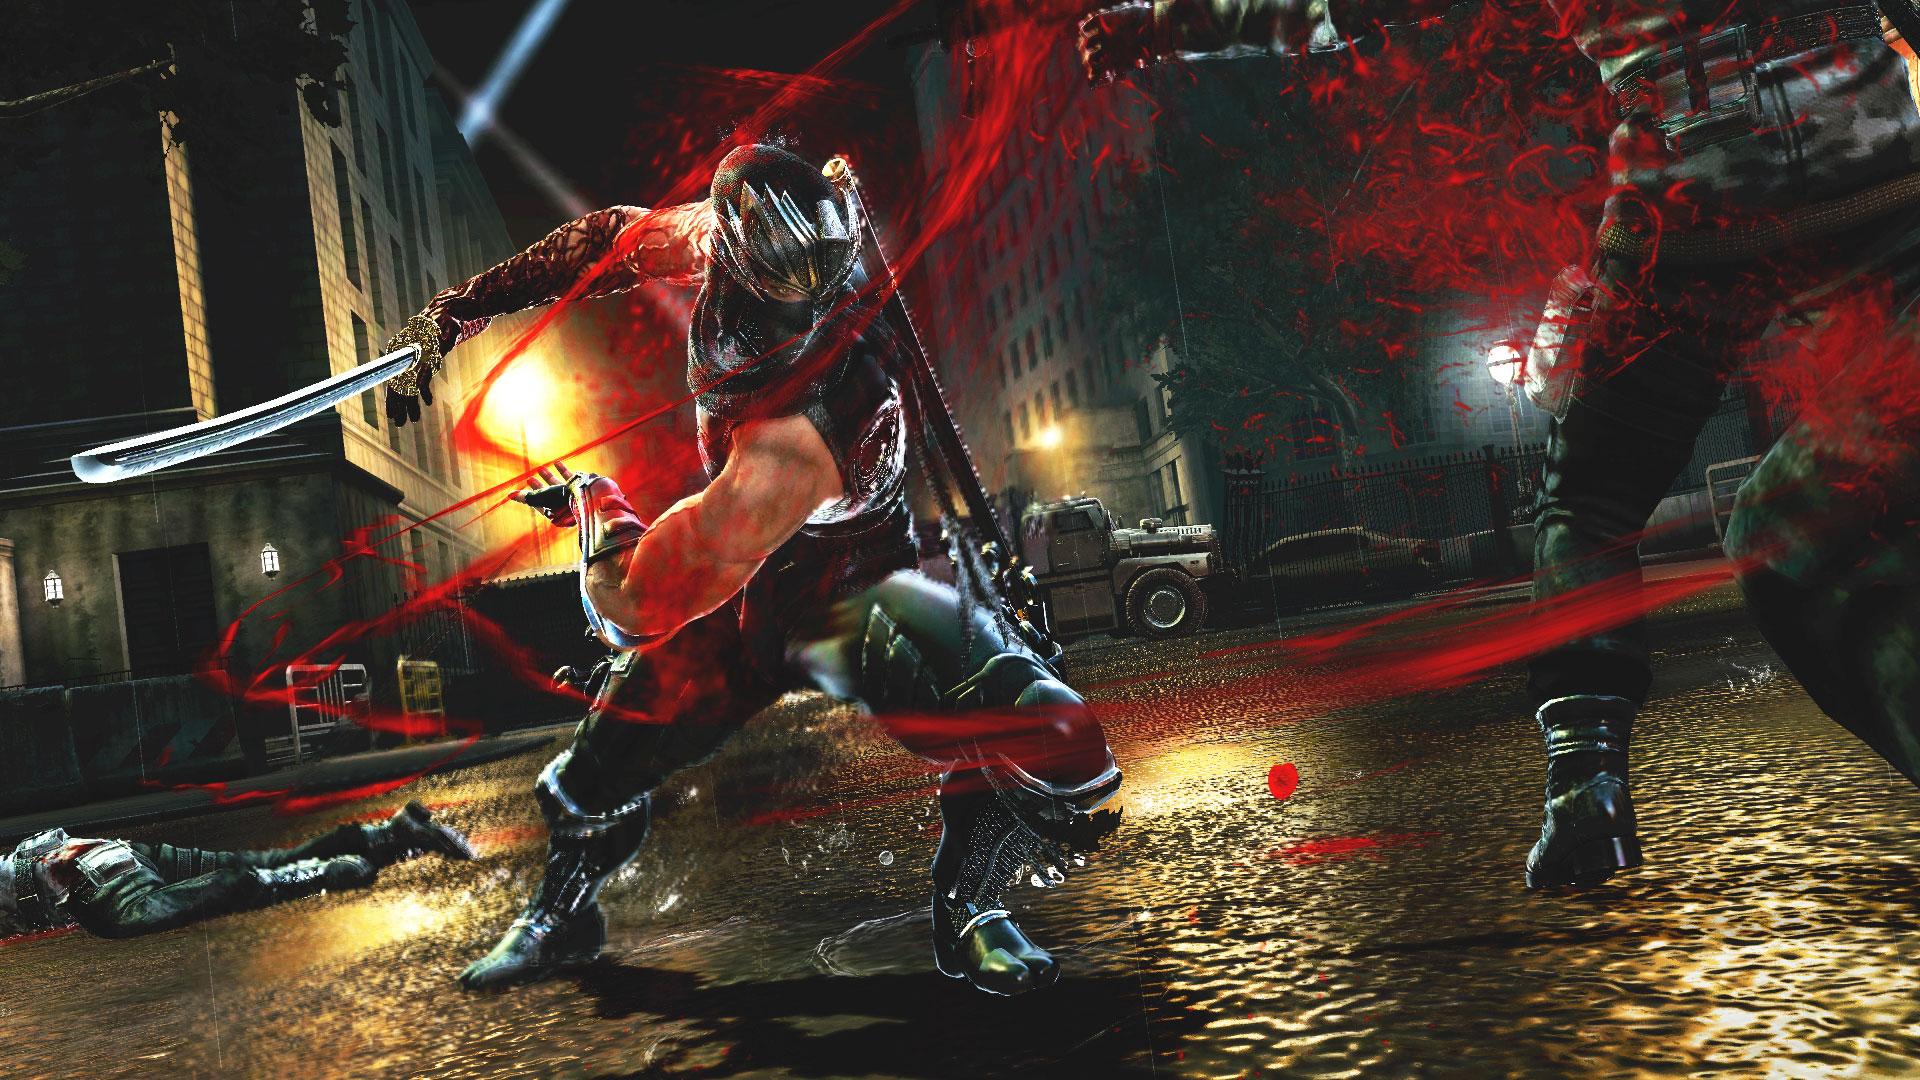 Ninja Gaiden 3 S Ryu Hayabusa Is More Relatable But Still A